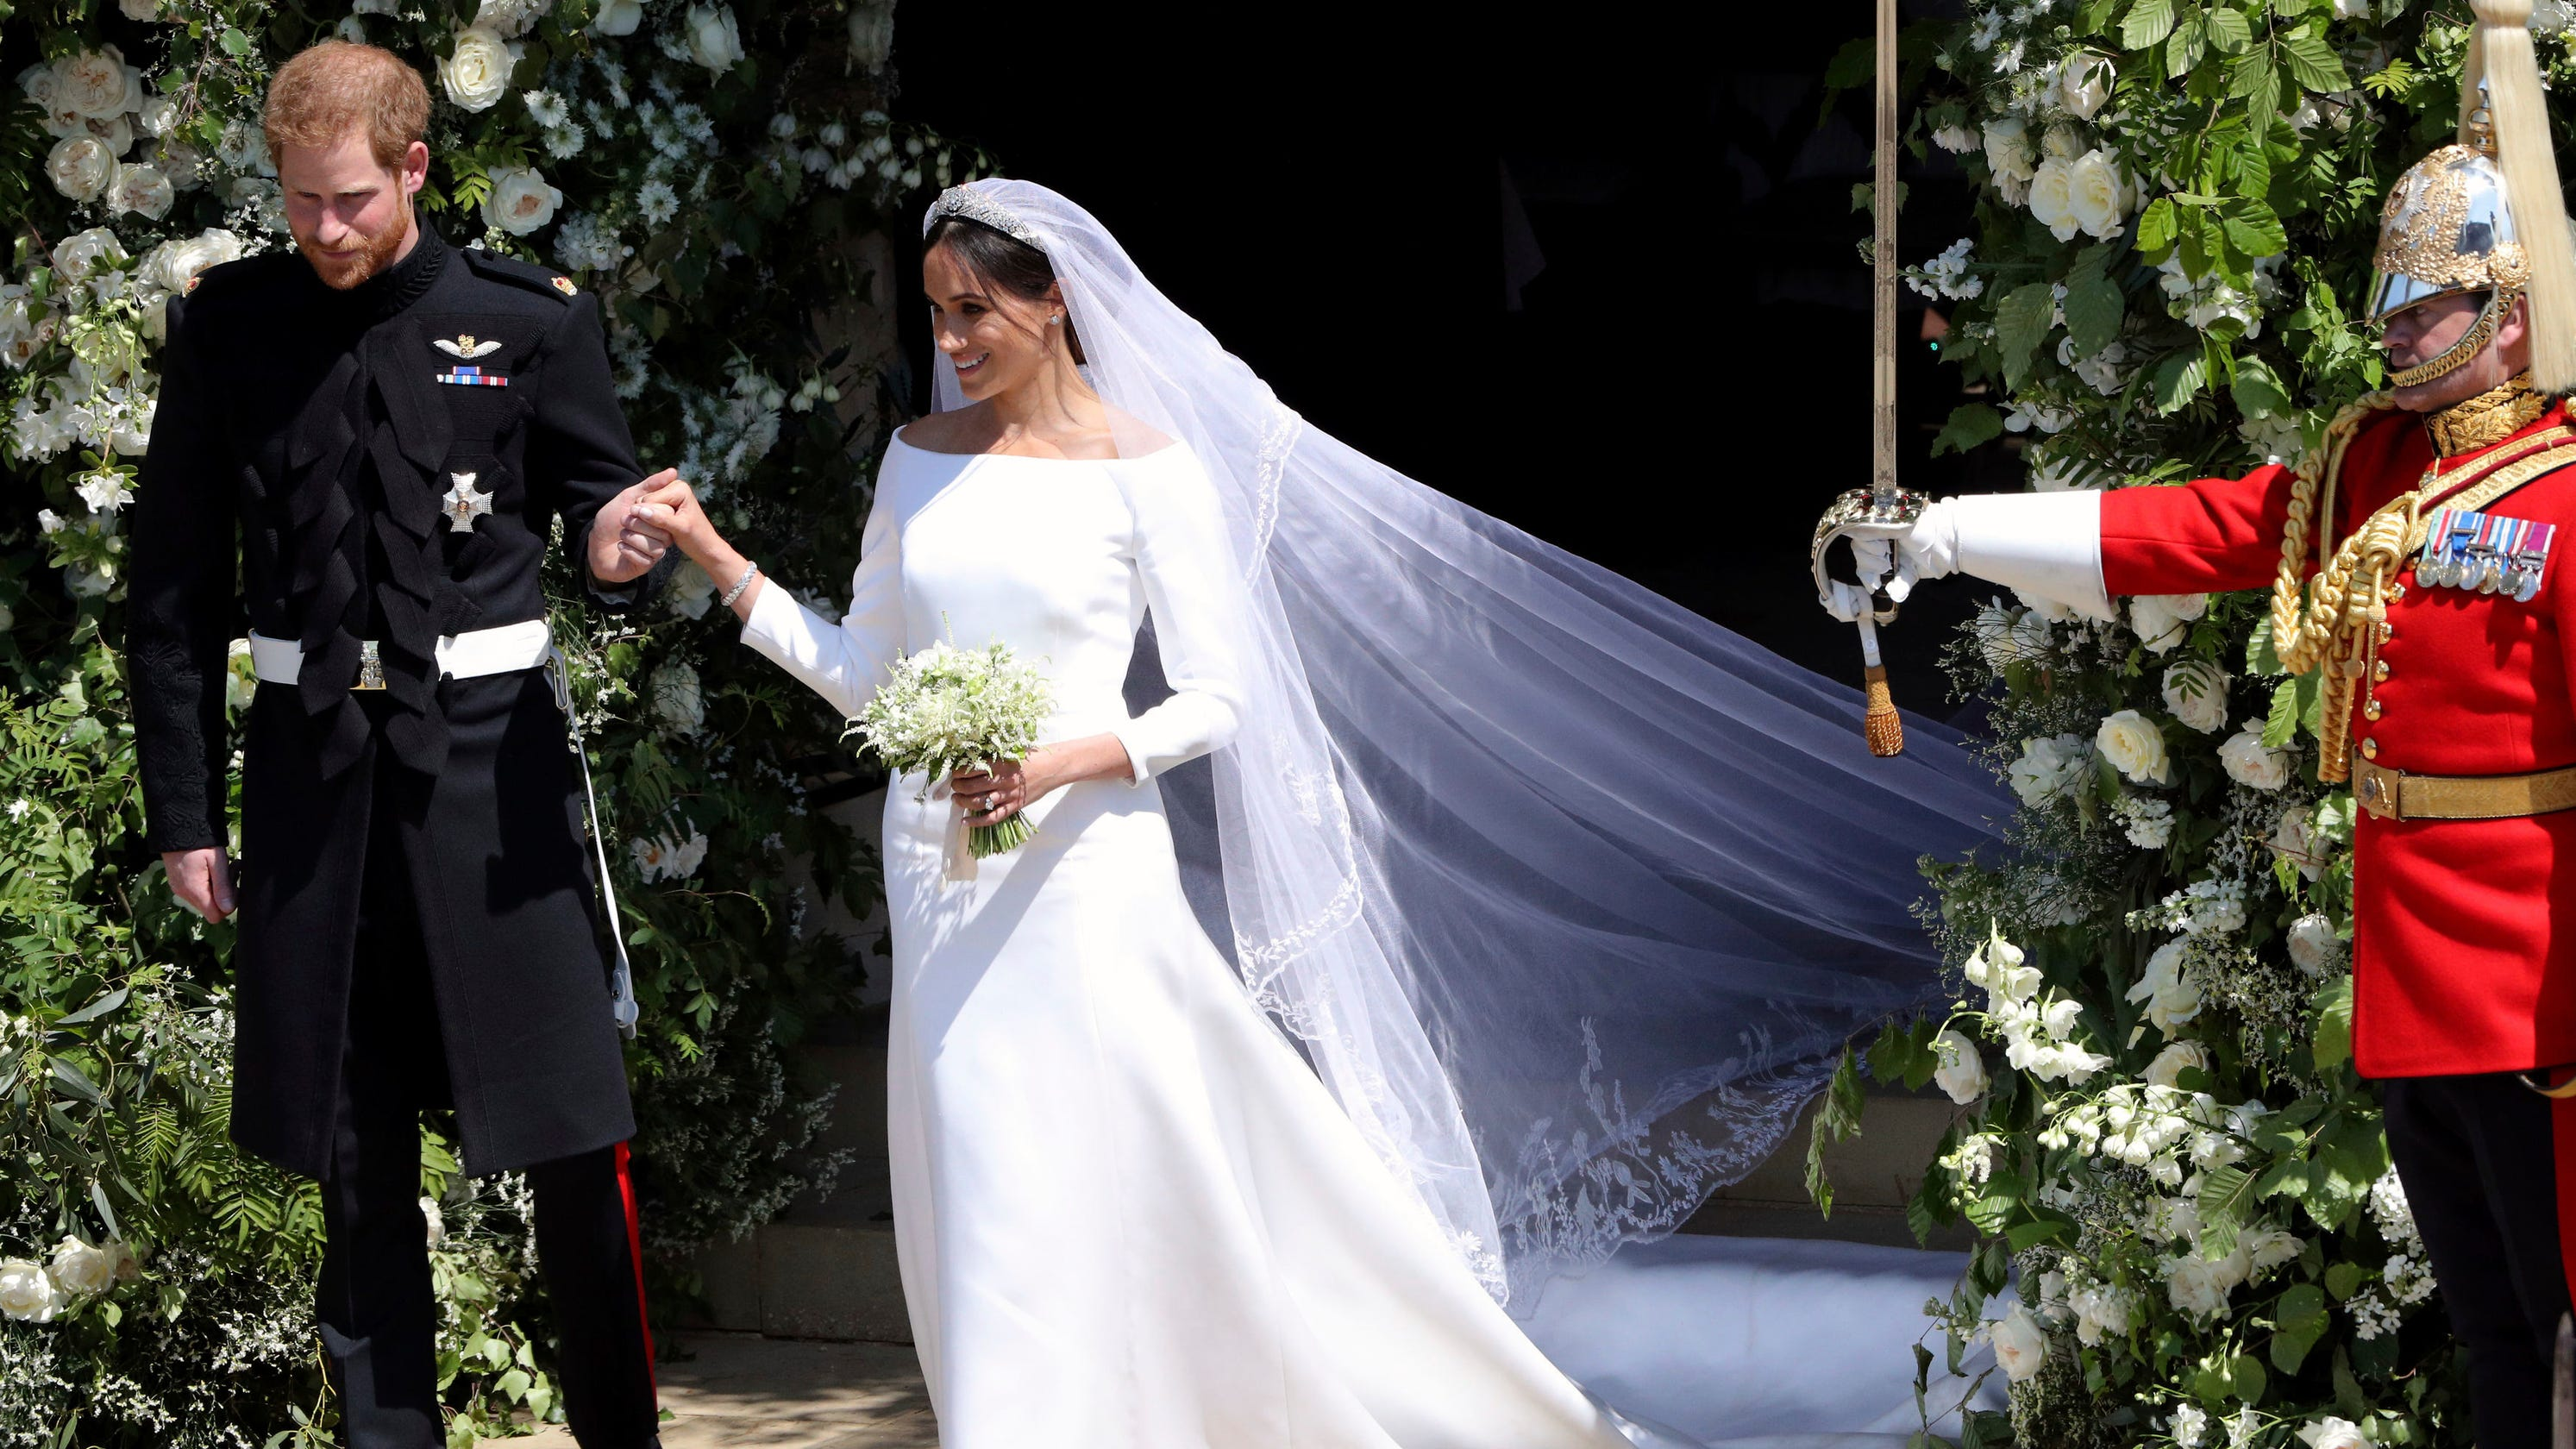 8c4e76e40 Duchess Meghan's sister apologizes, blames wedding snub for insults